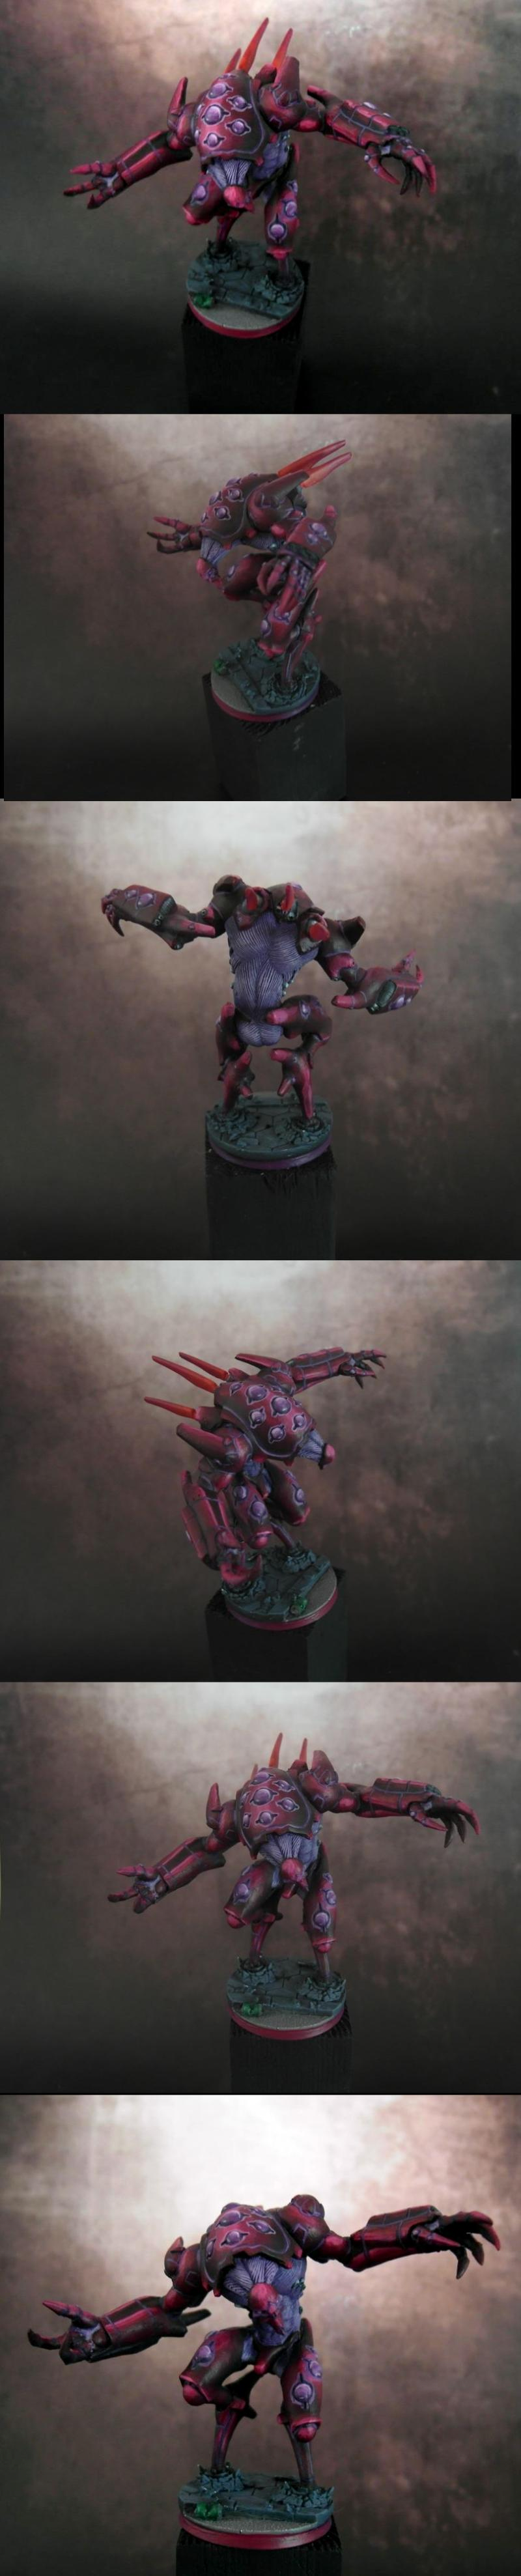 Aosol, Avatar, Combined Army, Corvus Belli, Ei, Infinity